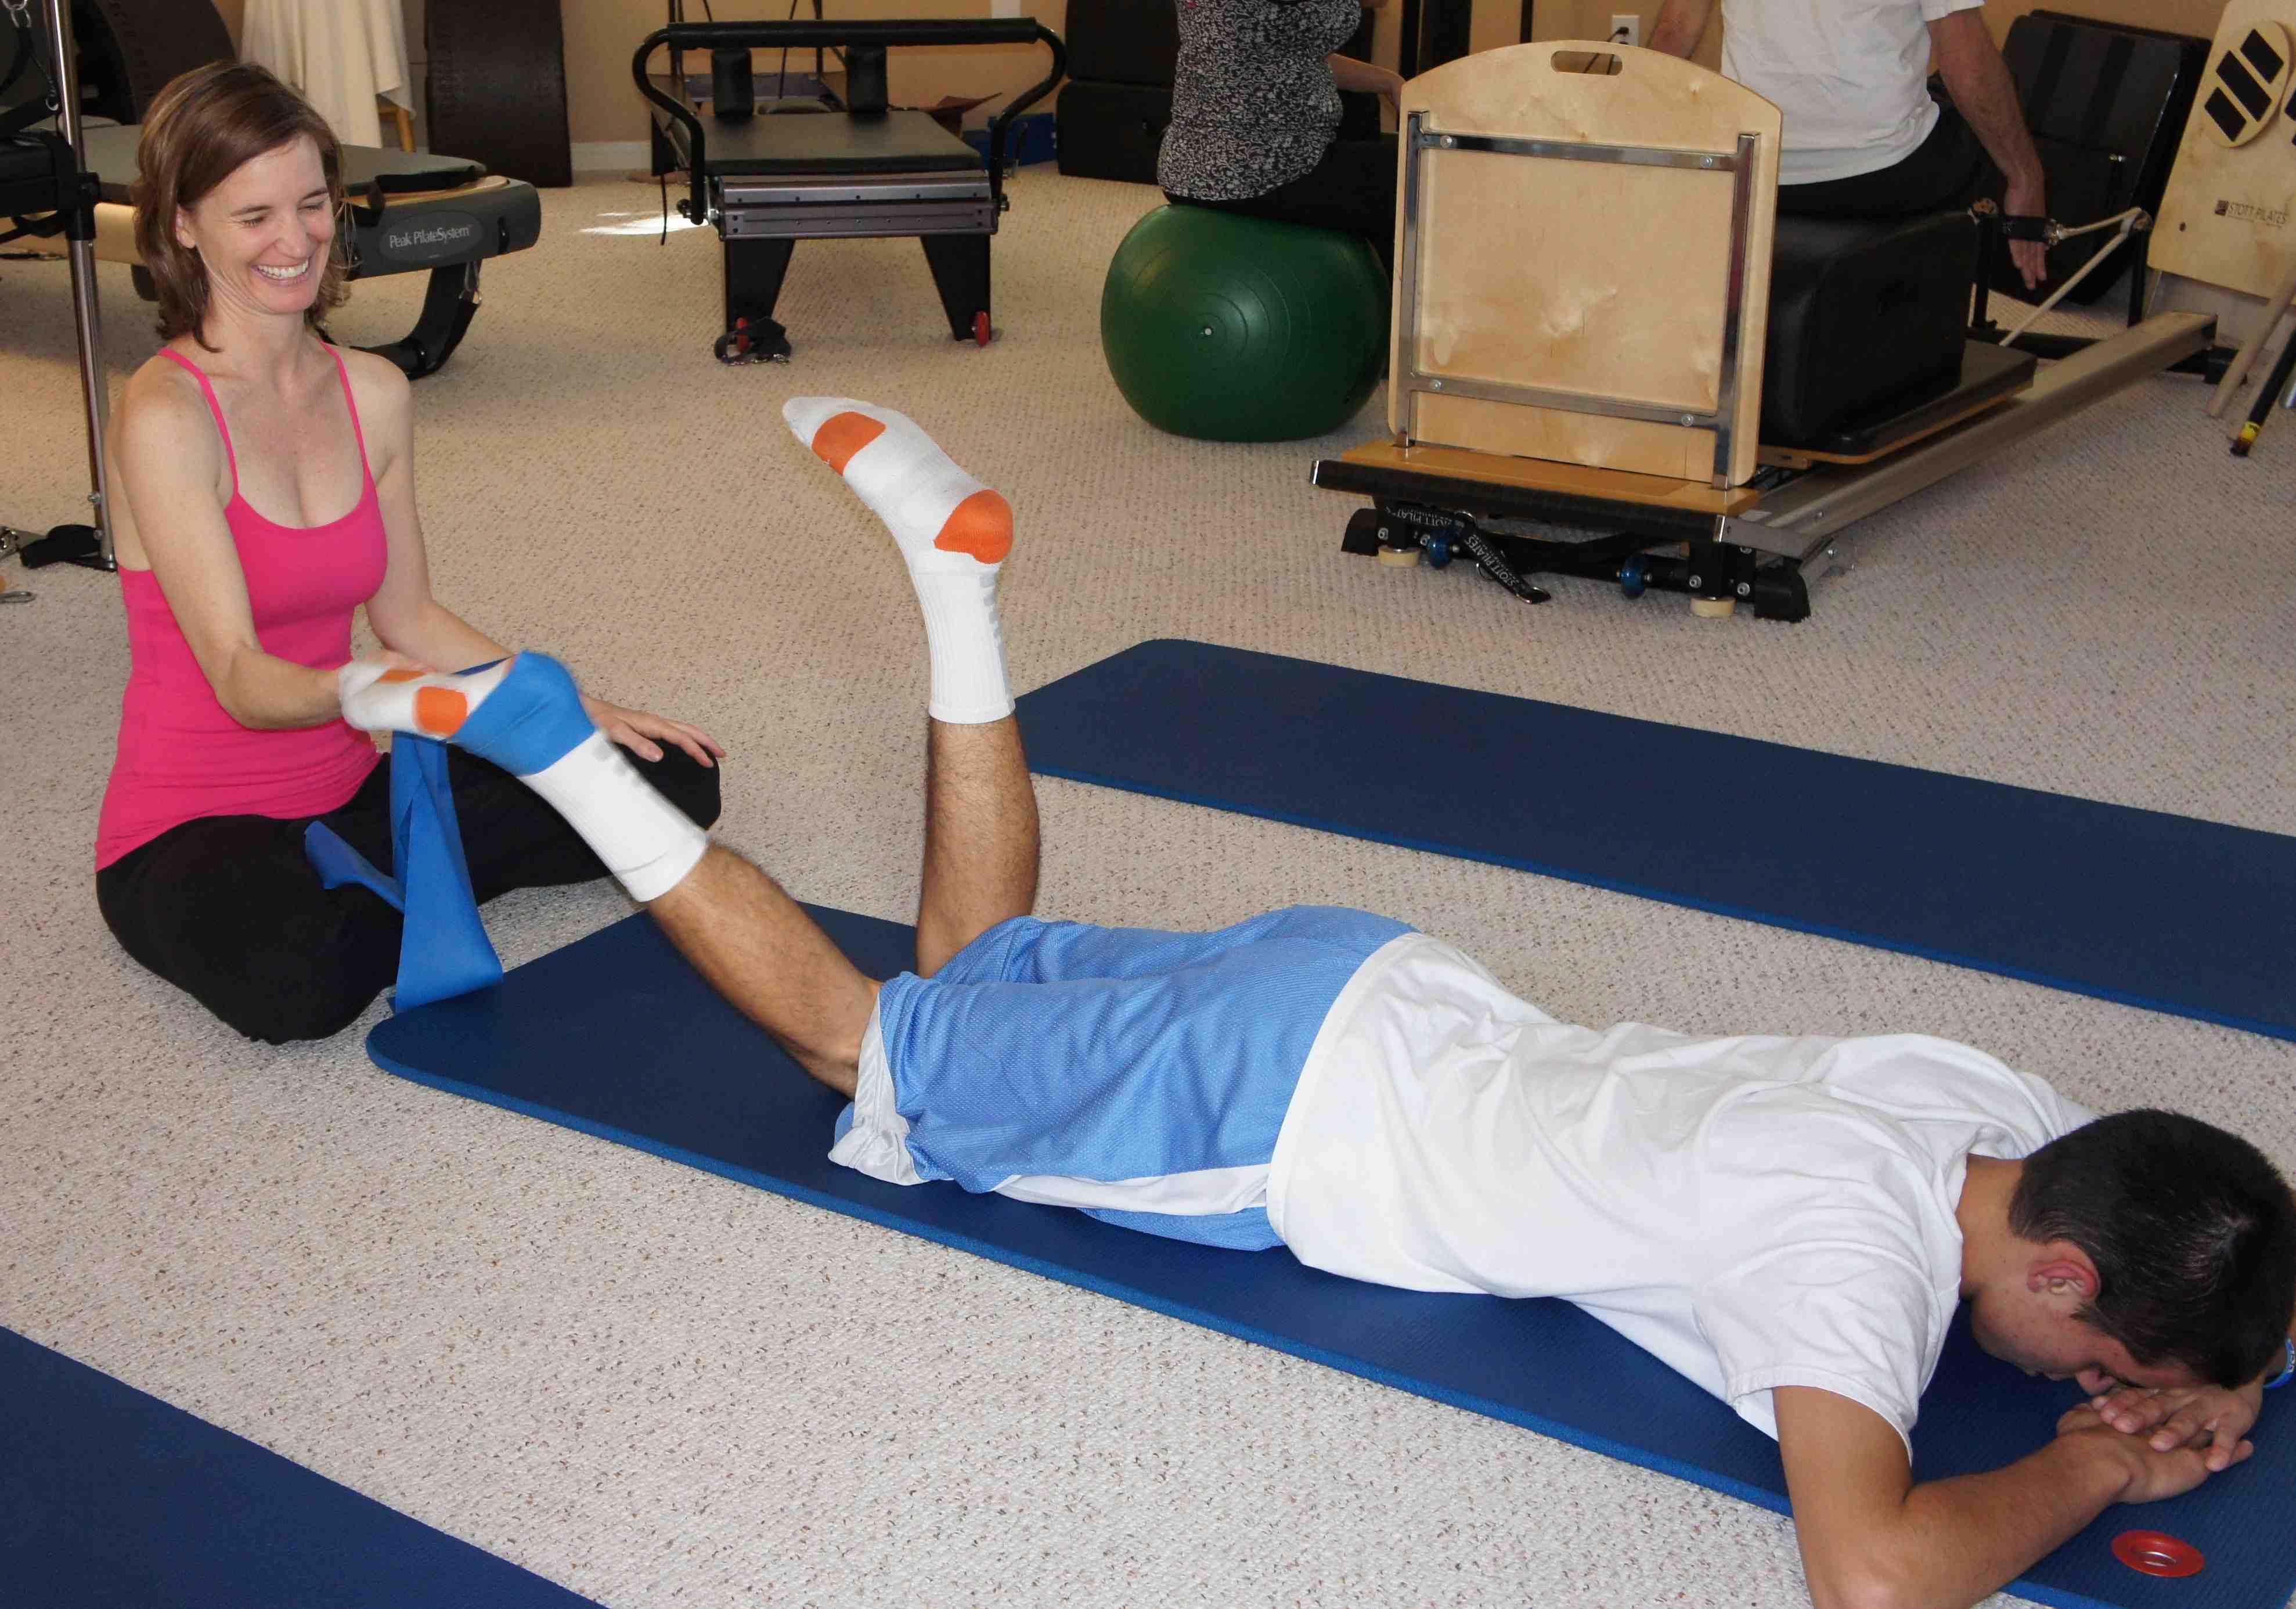 Pilates Exercises help Osgood Schlatter's Disease with Karena Thek